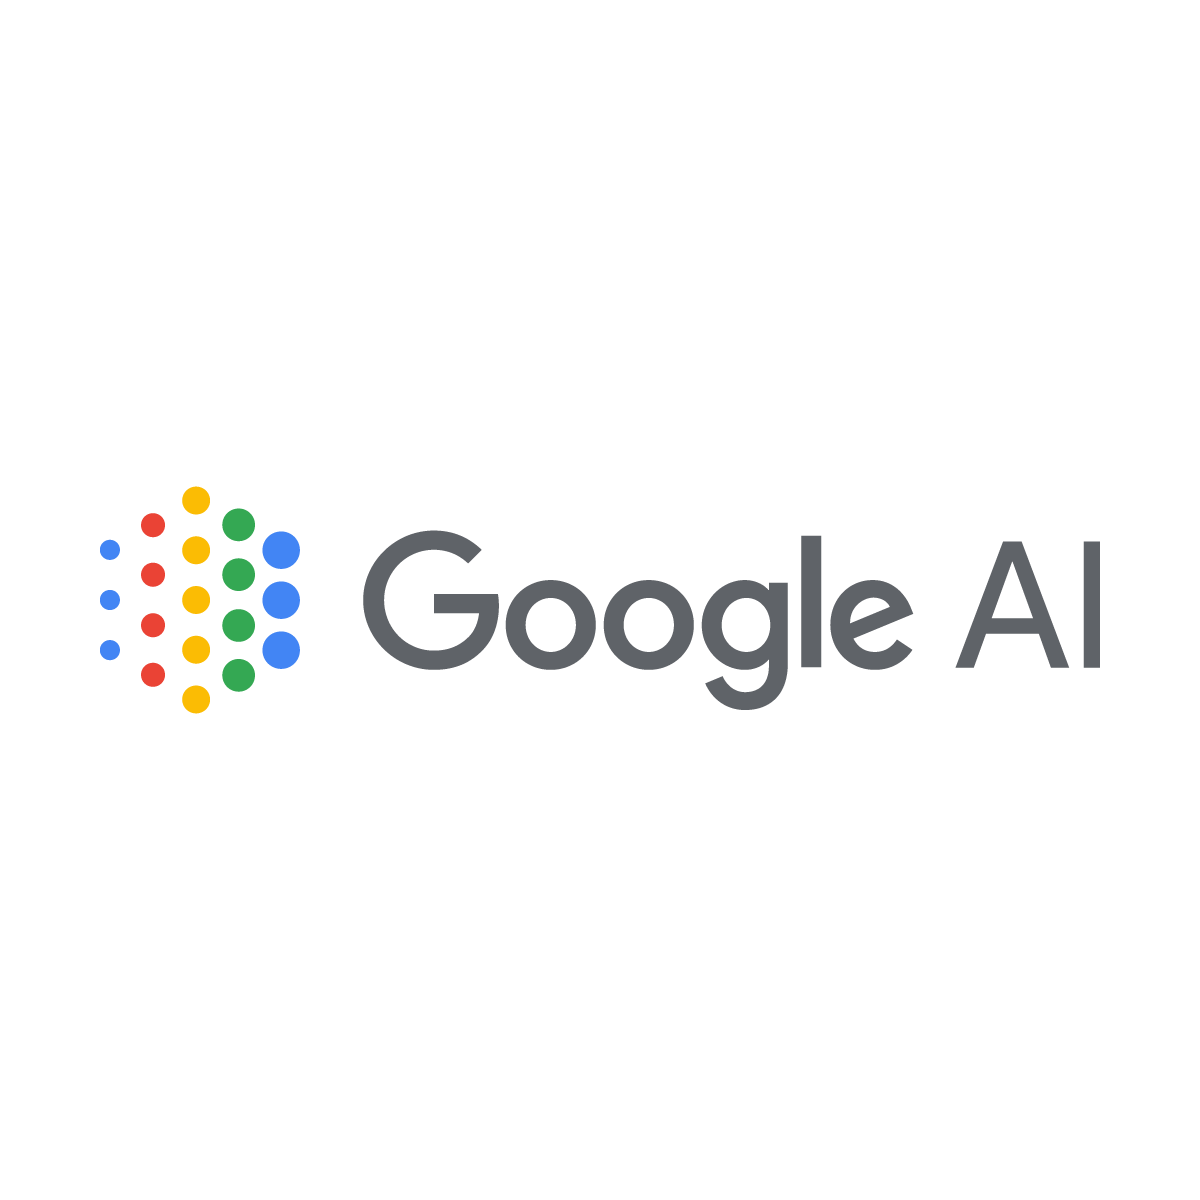 GoogleAI_logo_horizontal_color_rgb.png